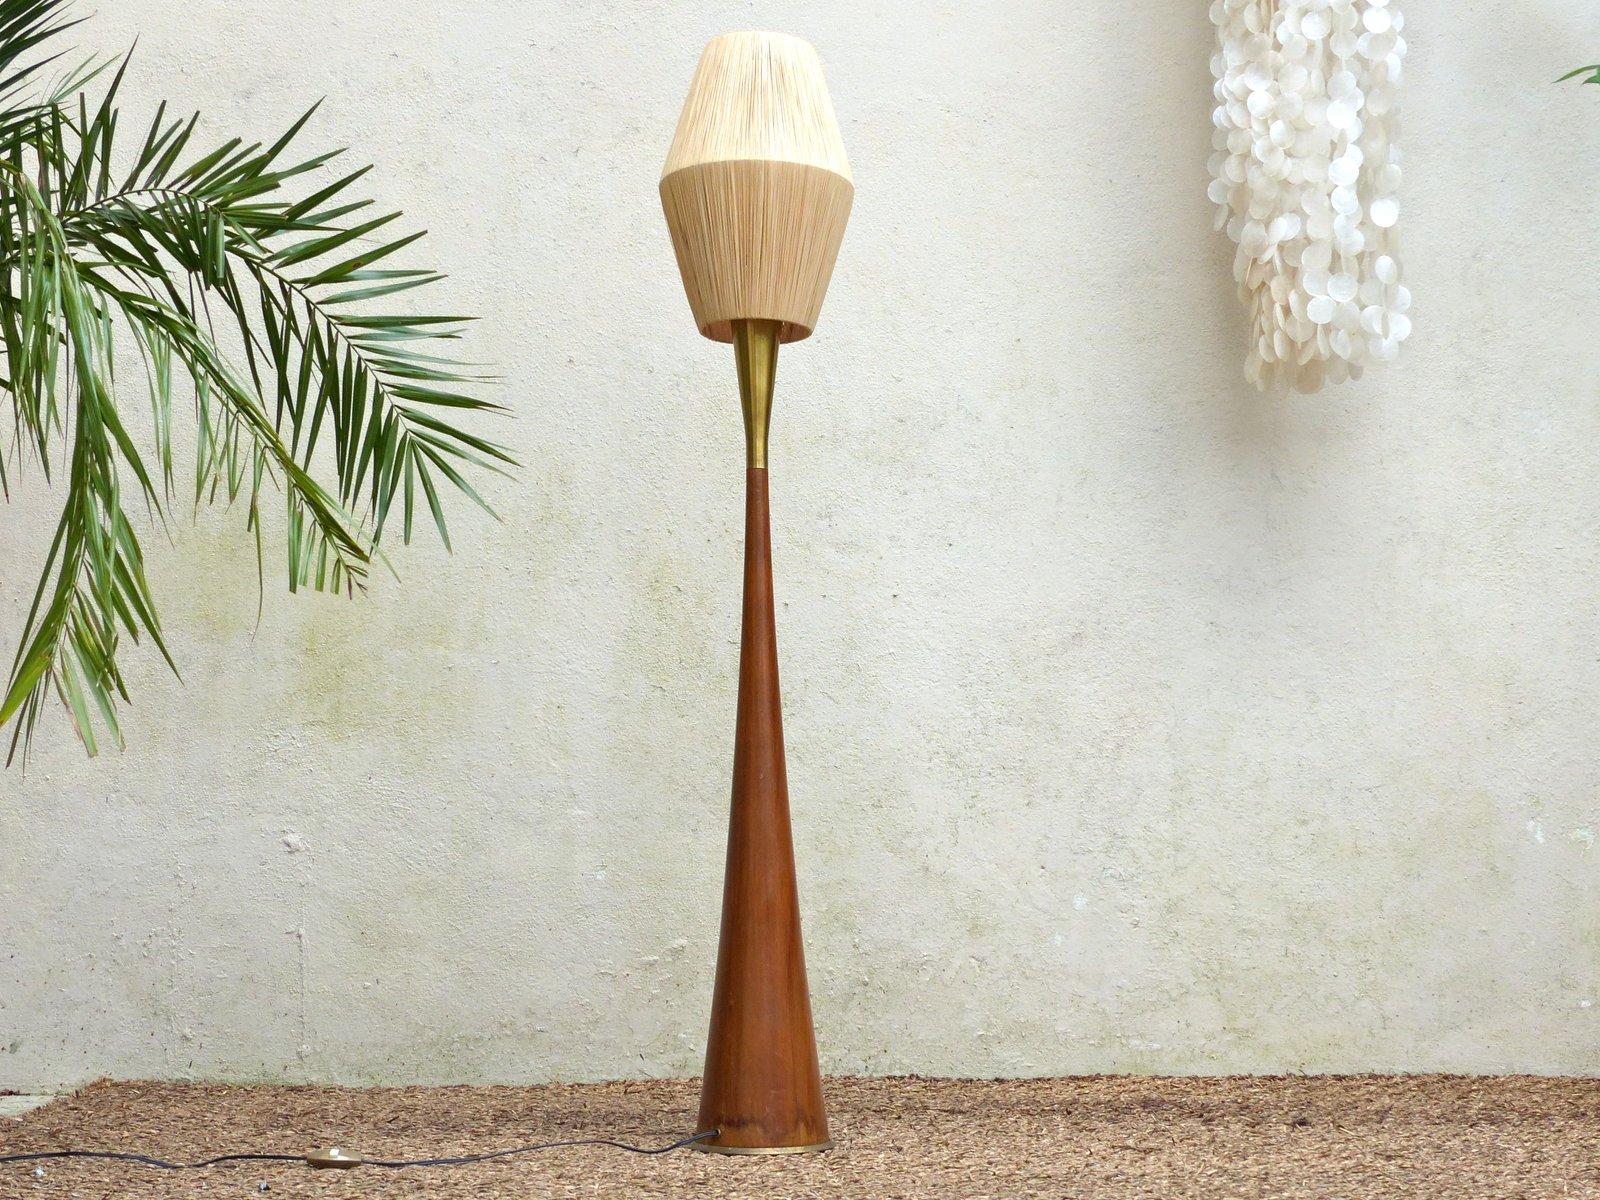 lampadaire diabolo vintage scandinave en vente sur pamono. Black Bedroom Furniture Sets. Home Design Ideas